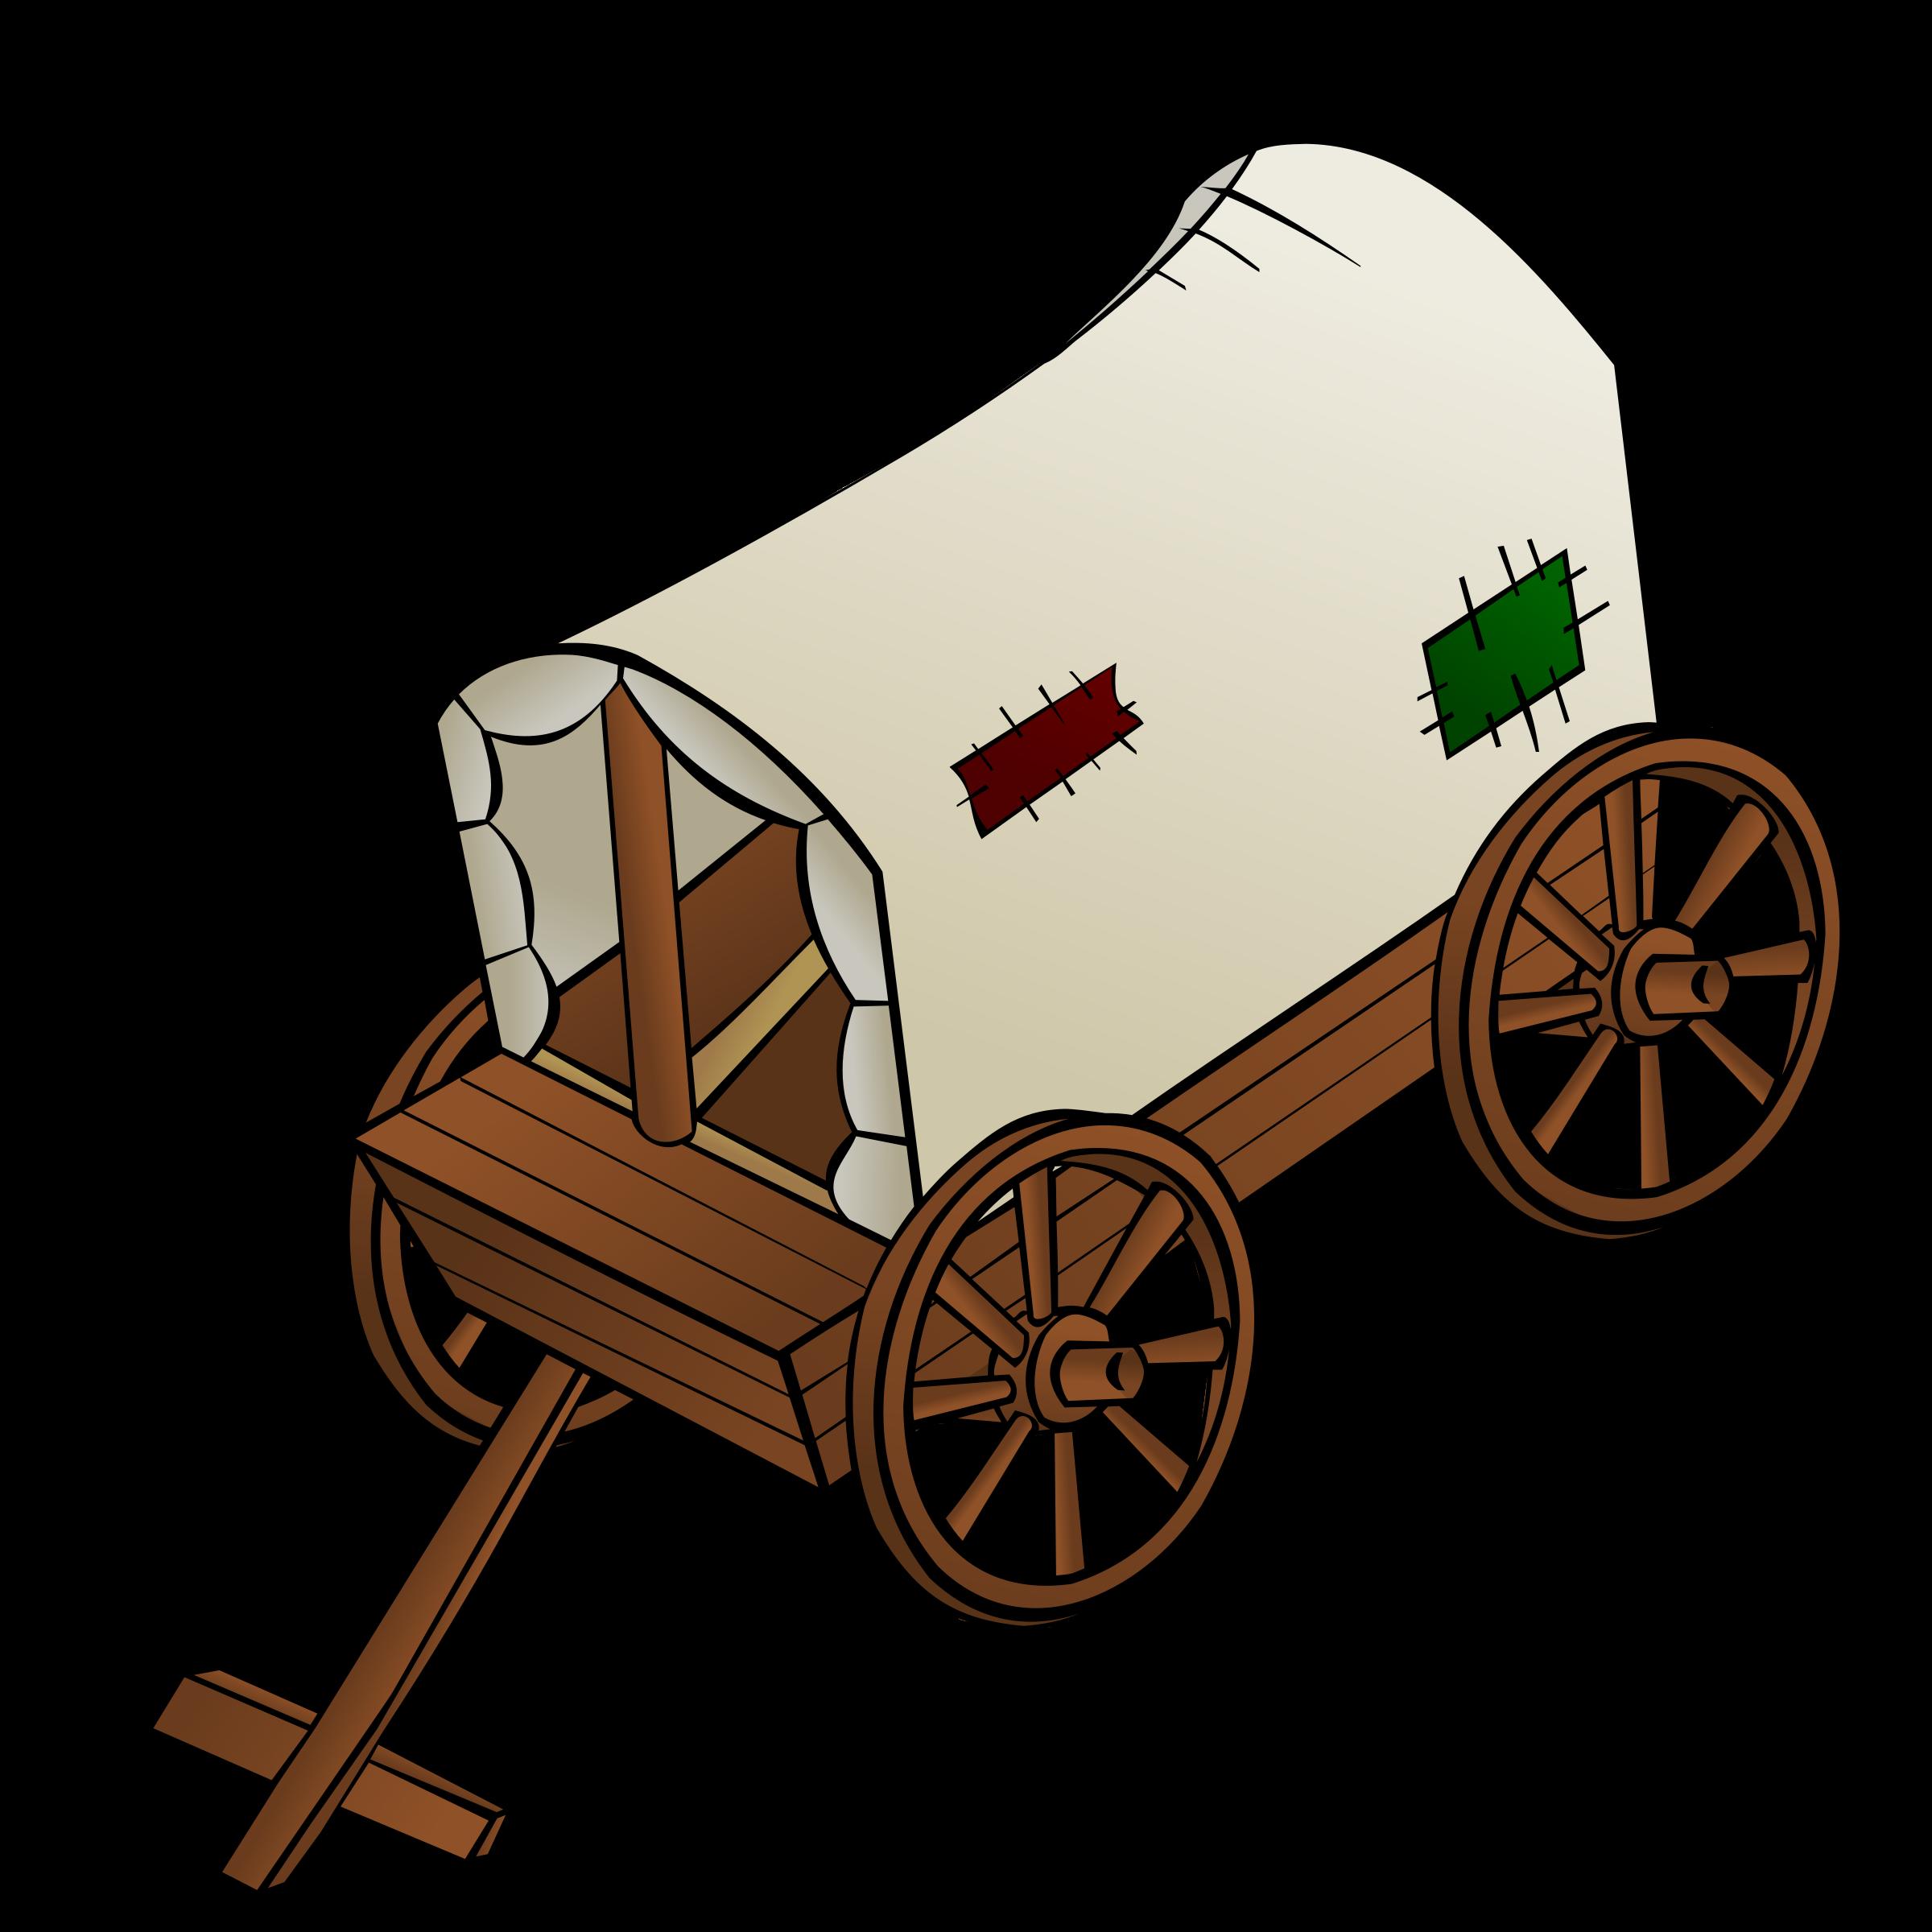 Rpg map symbols a. Wagon clipart settler